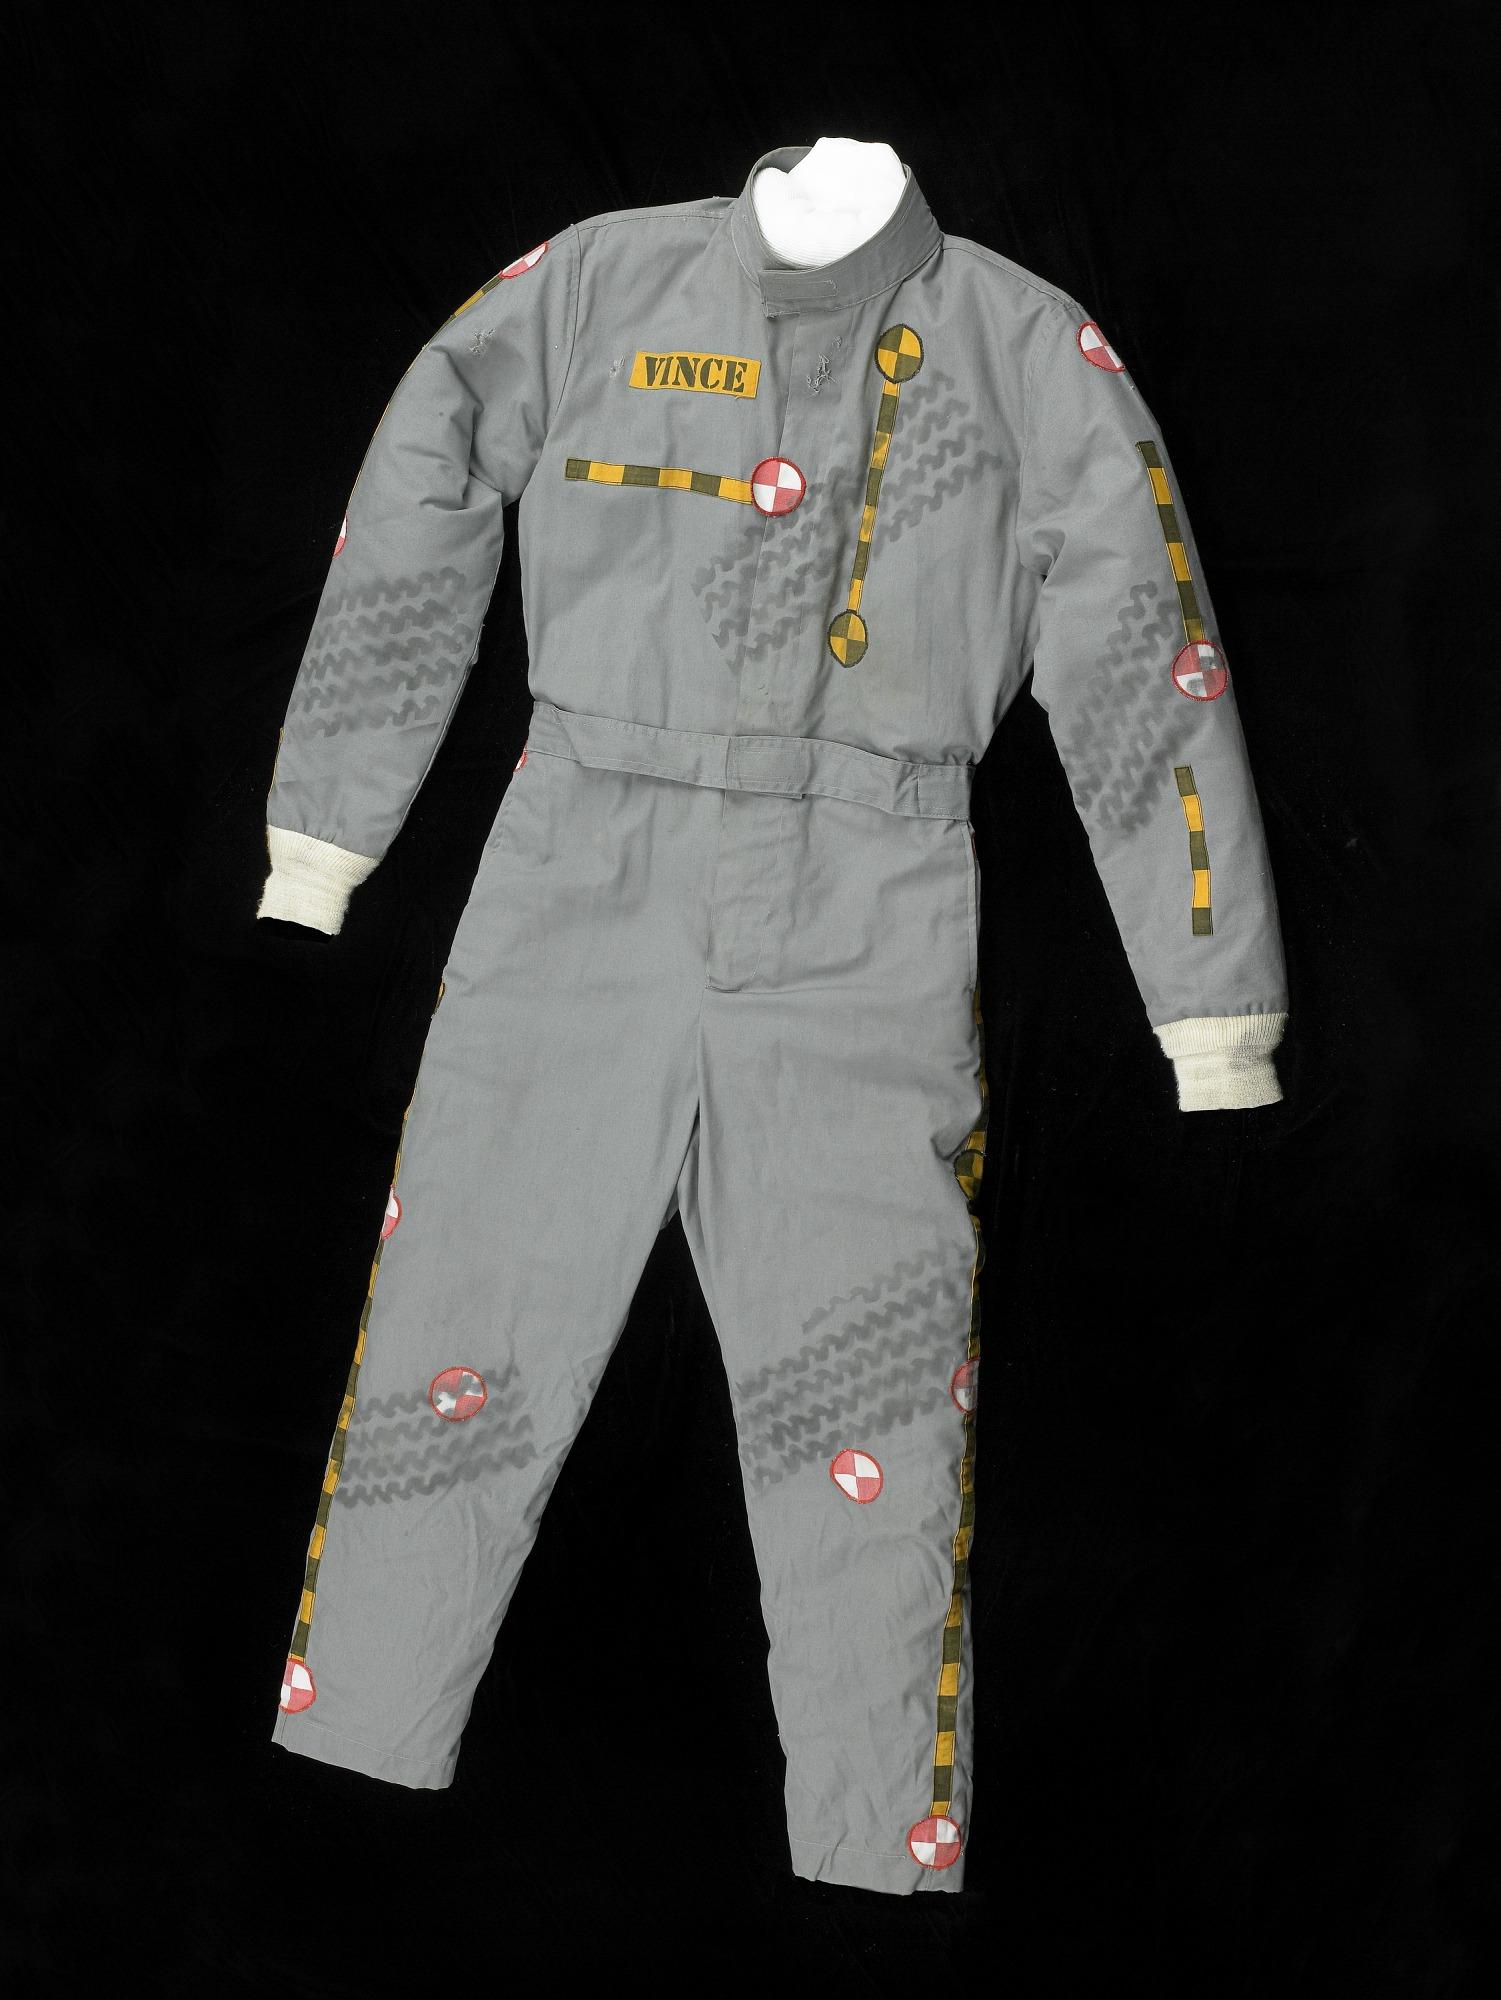 Vince Crash Dummy Costume, 1990s